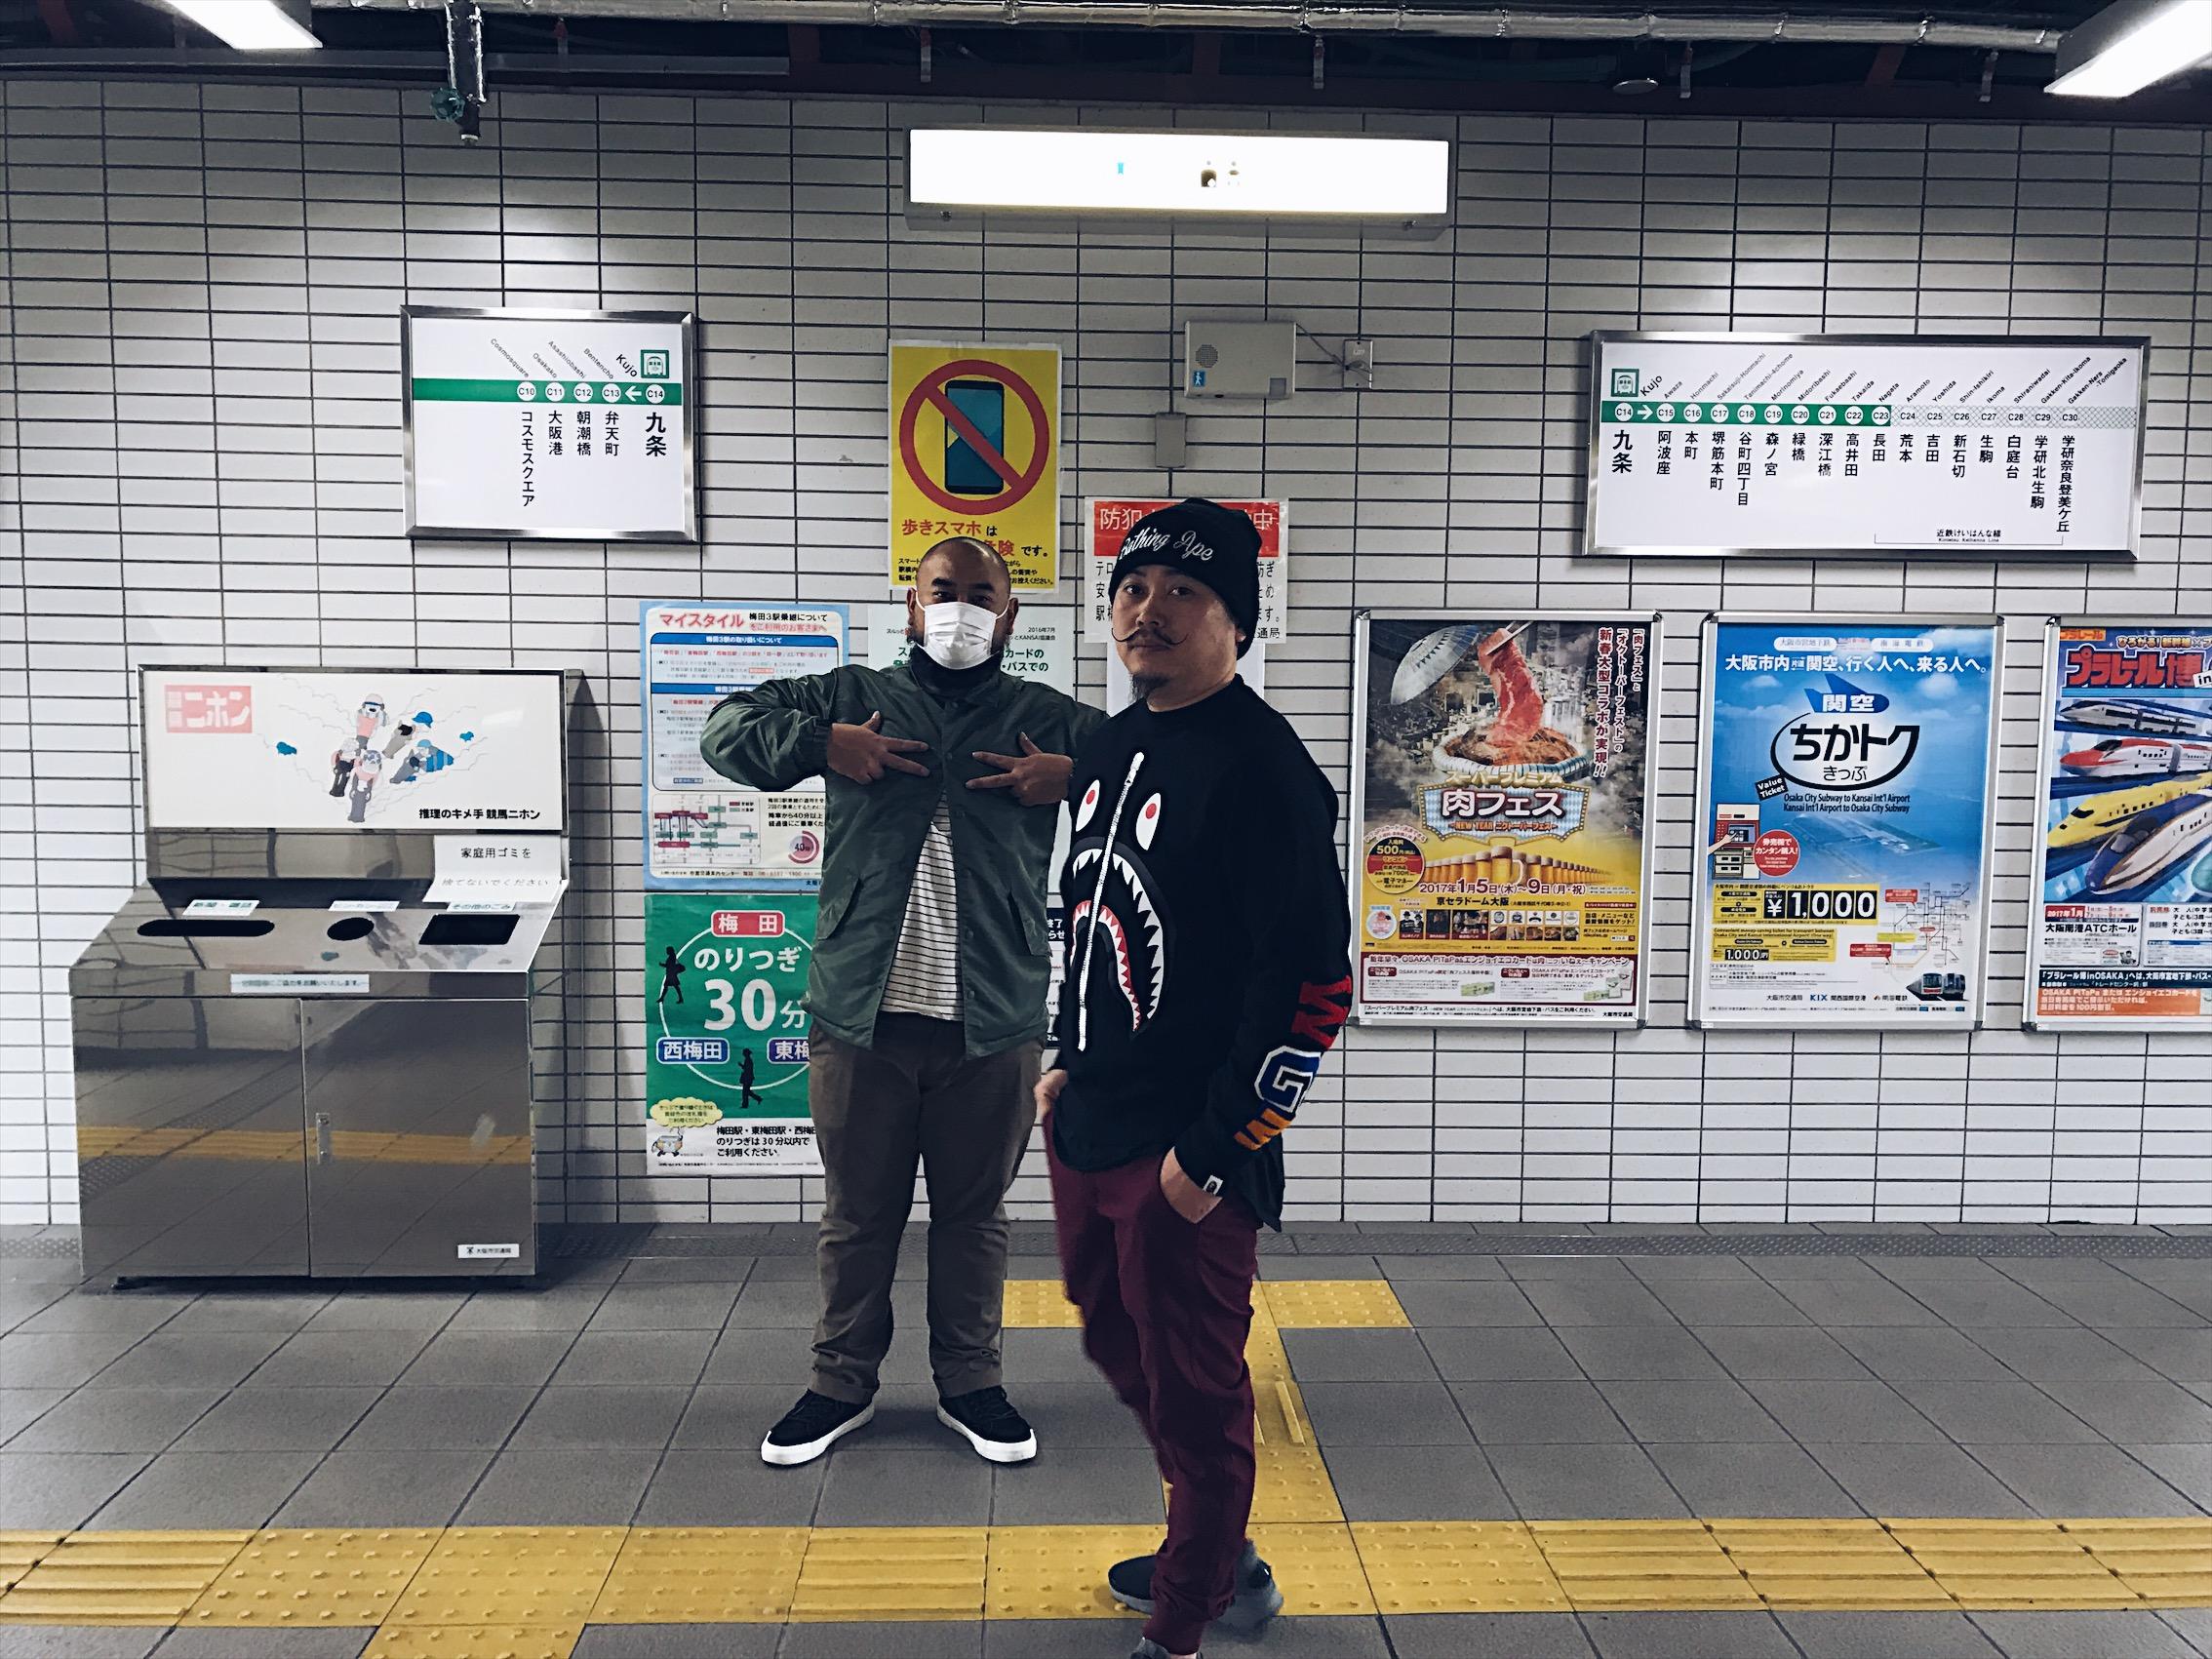 Train station, catching a train to the Osaka Aquarium.